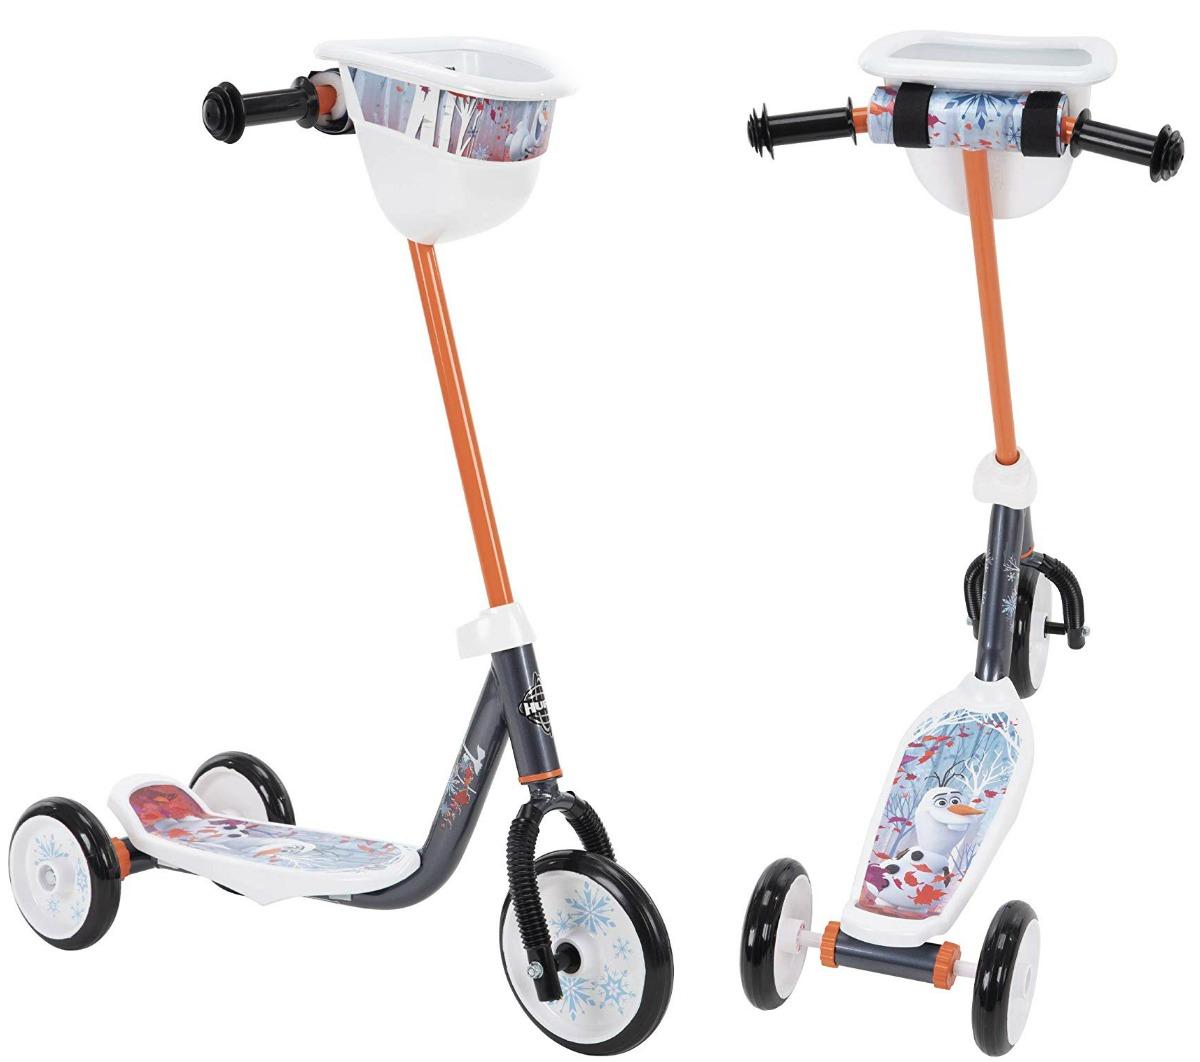 Disney Frozen-themed kids 3-wheel scooter stock image